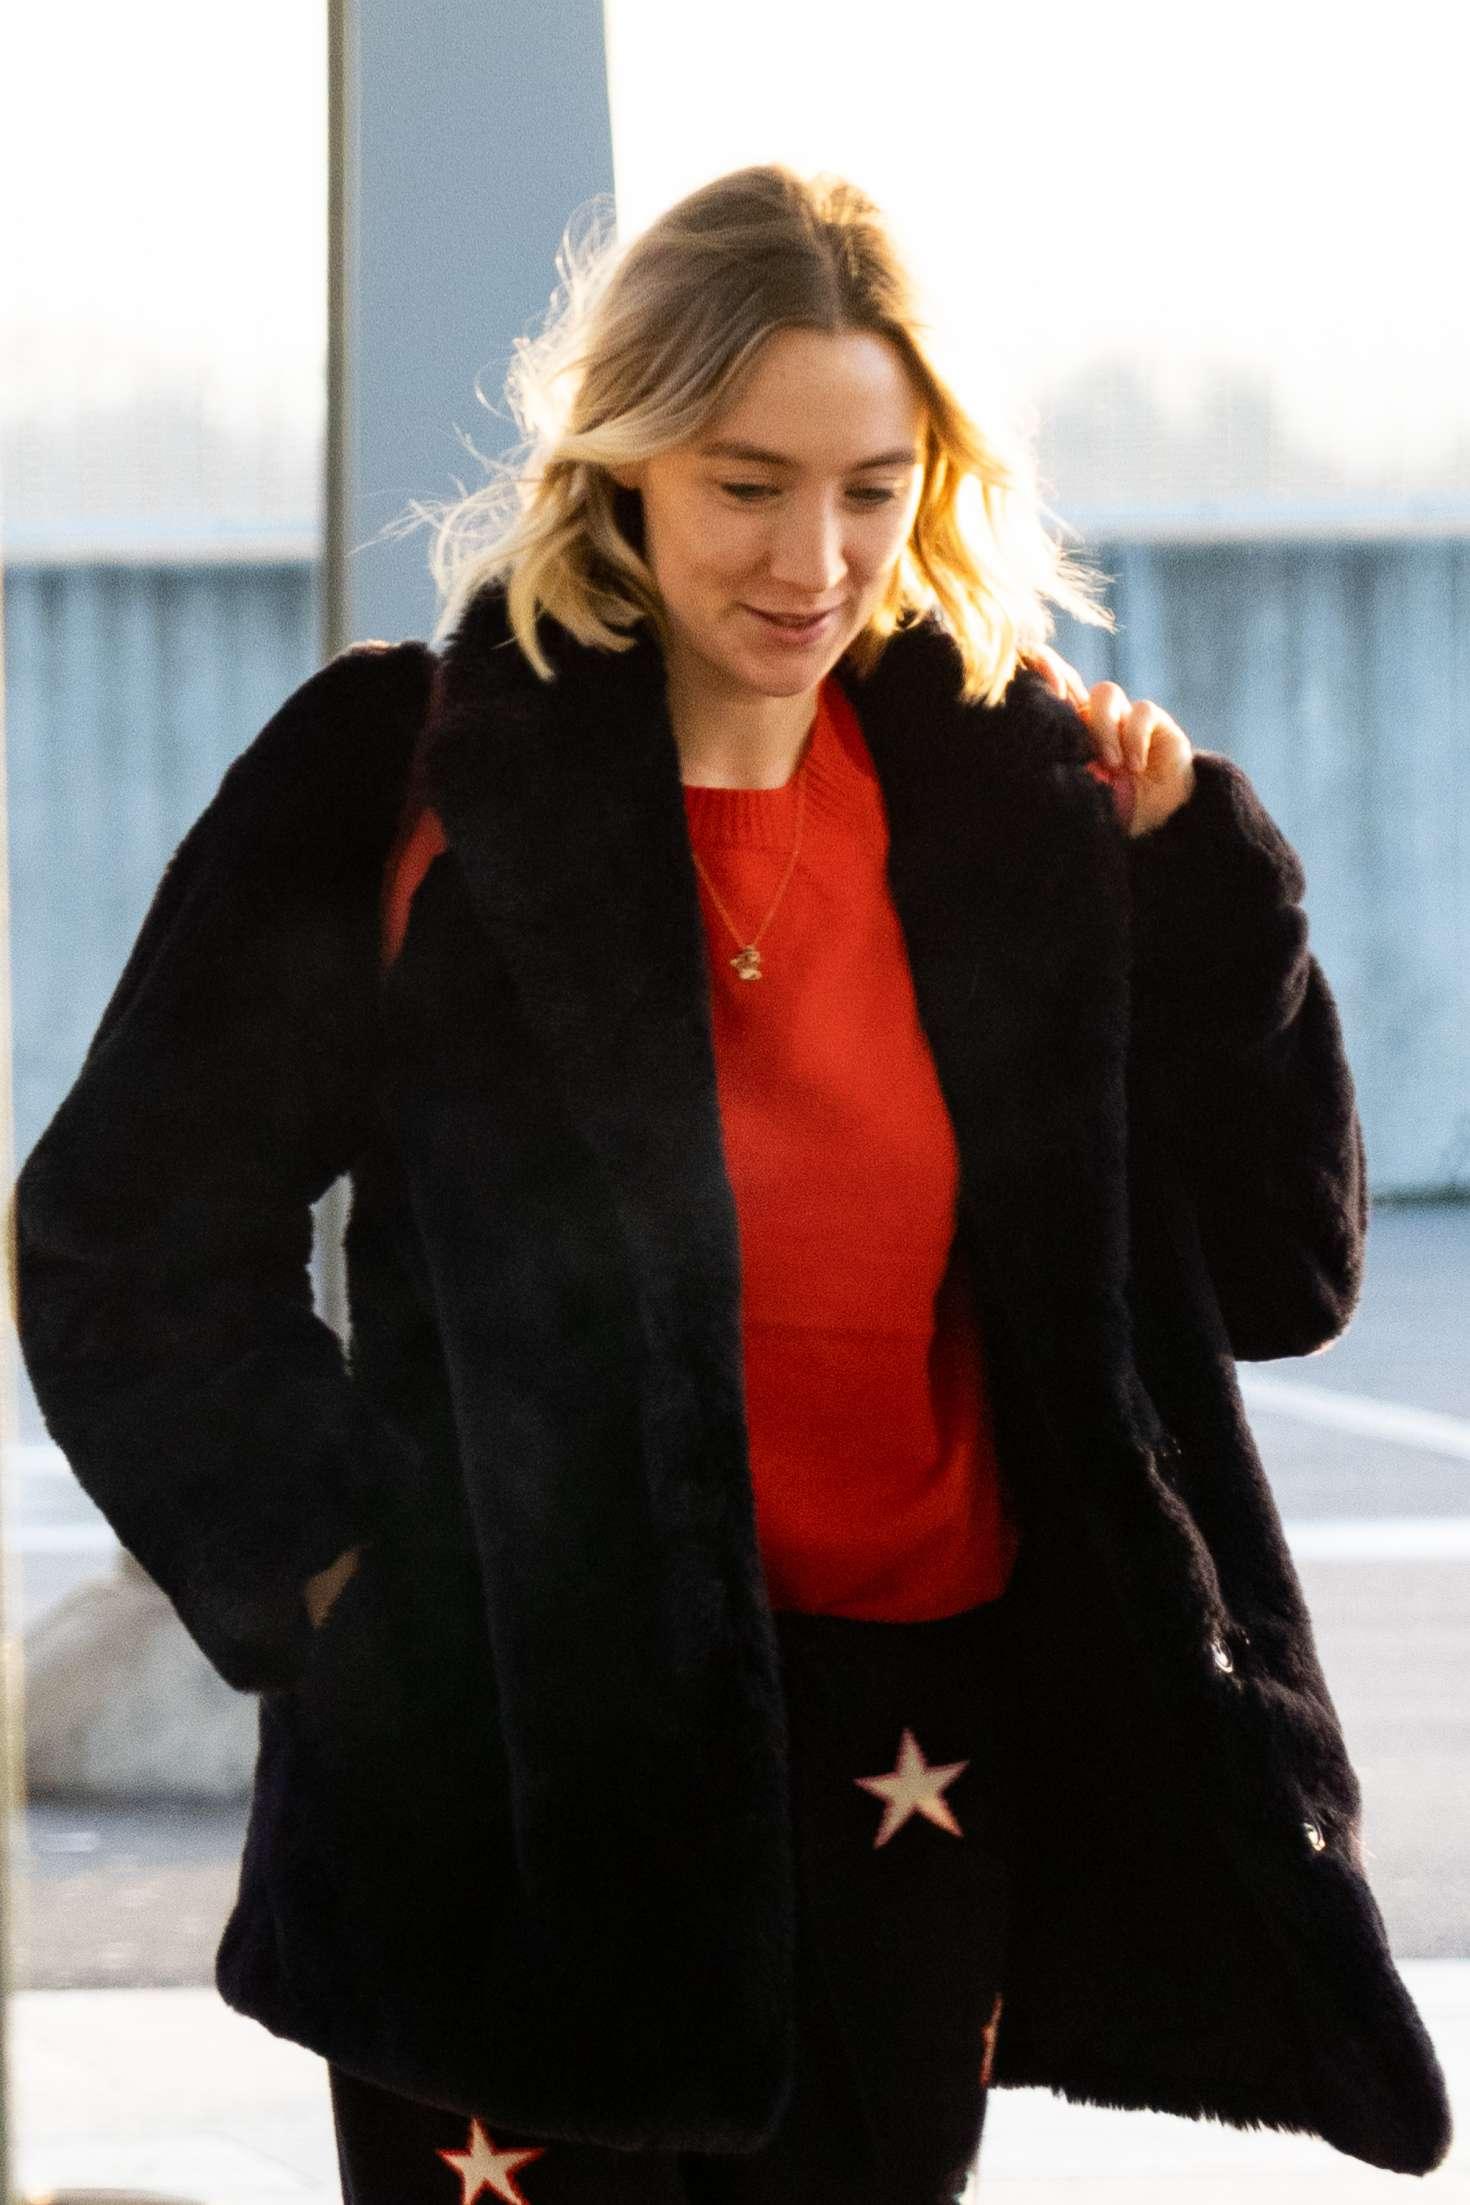 Saoirse Ronan - Arrives at Heathrow Airport in London